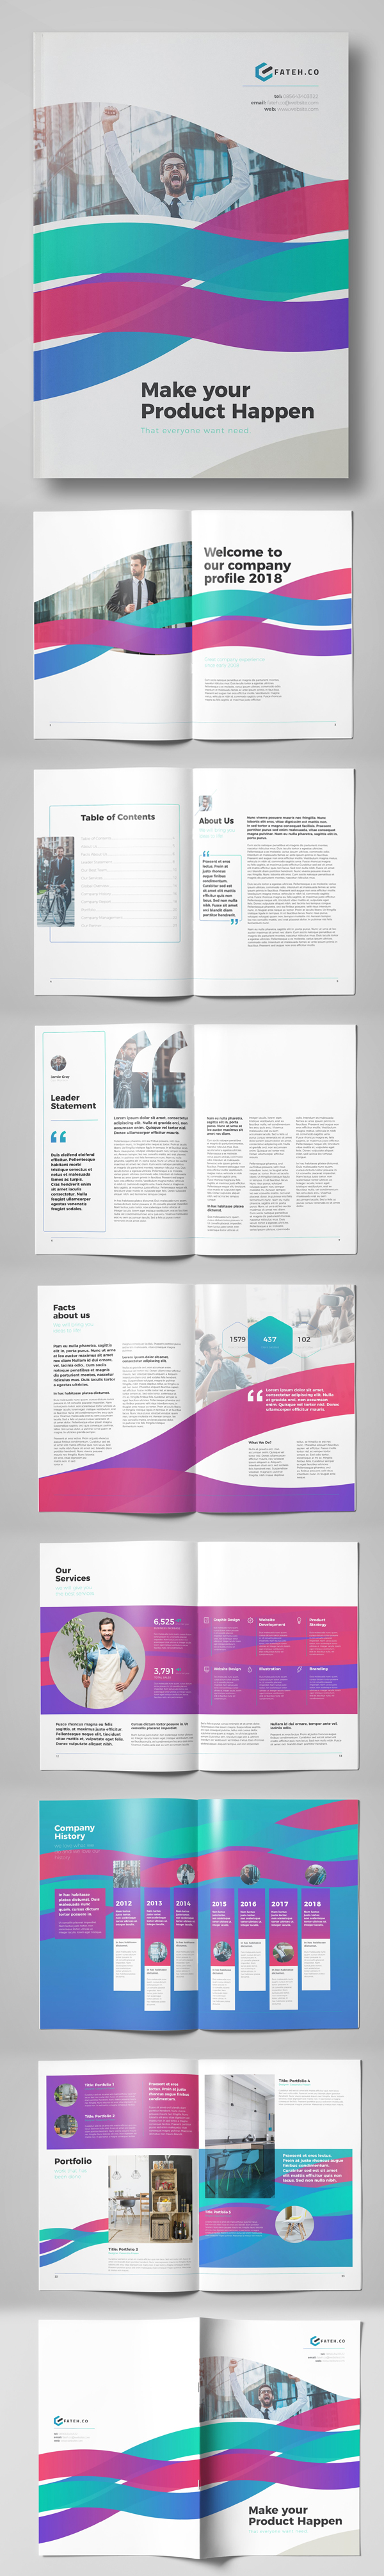 100 Professional Corporate Brochure Templates - 40